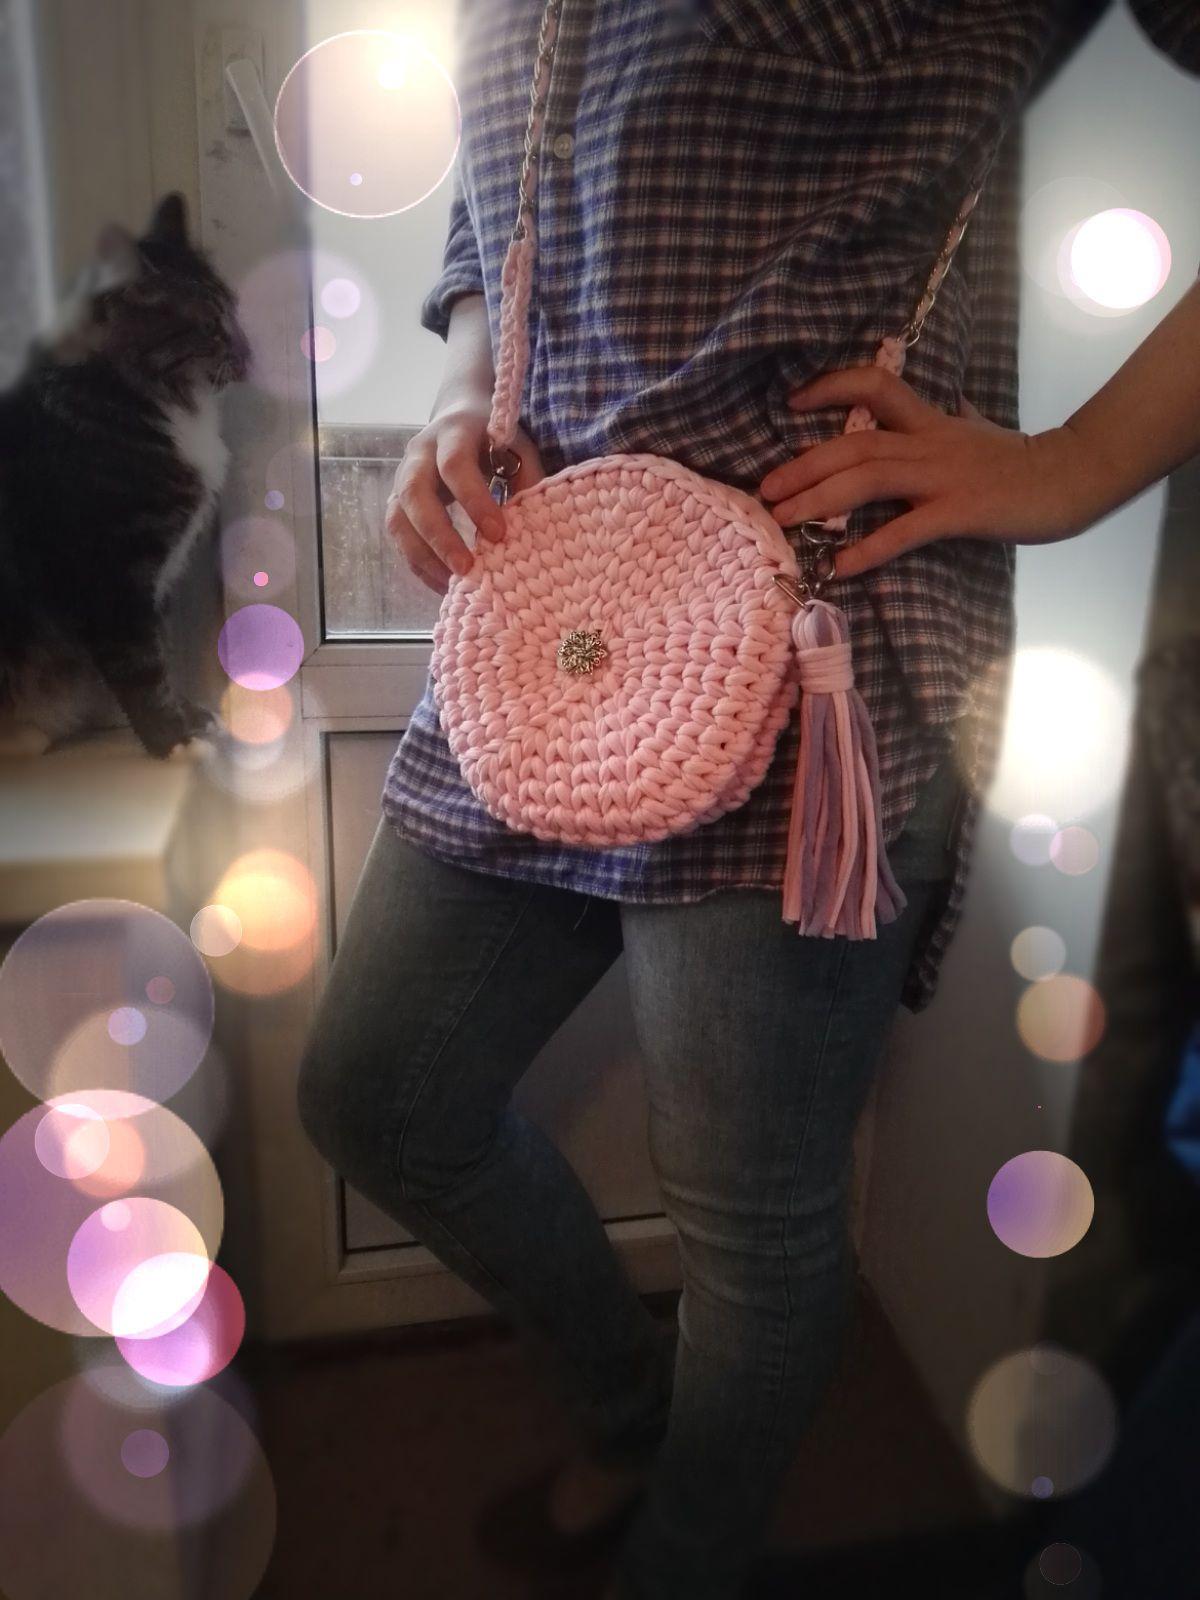 розовый трикотажная круглая клатч сумка пряжа